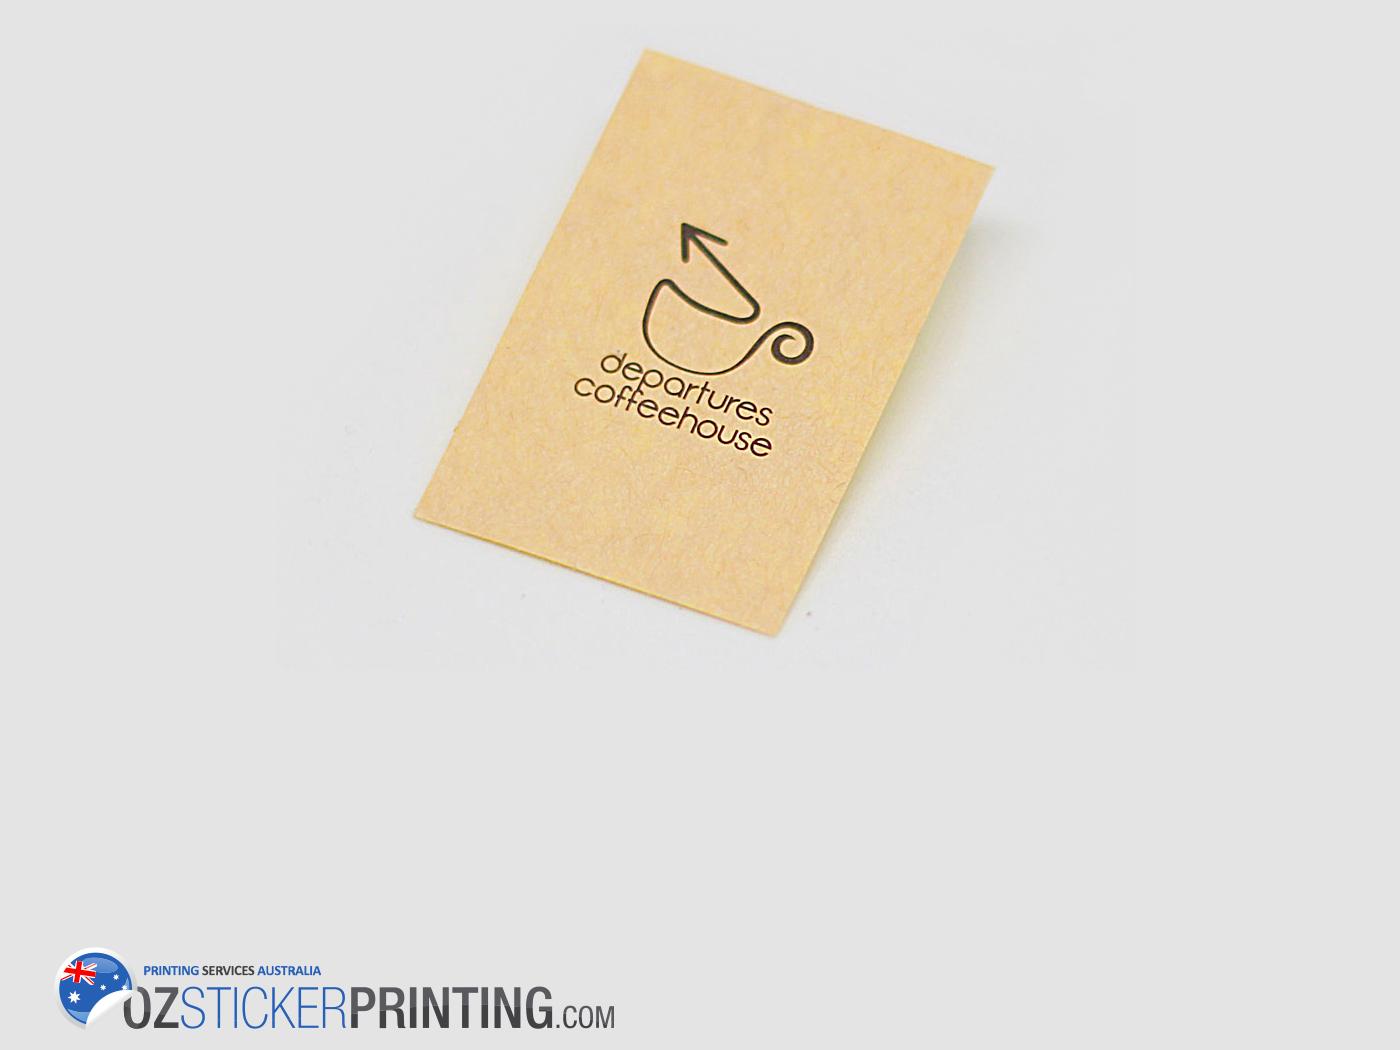 Custom cheap stickers sydney